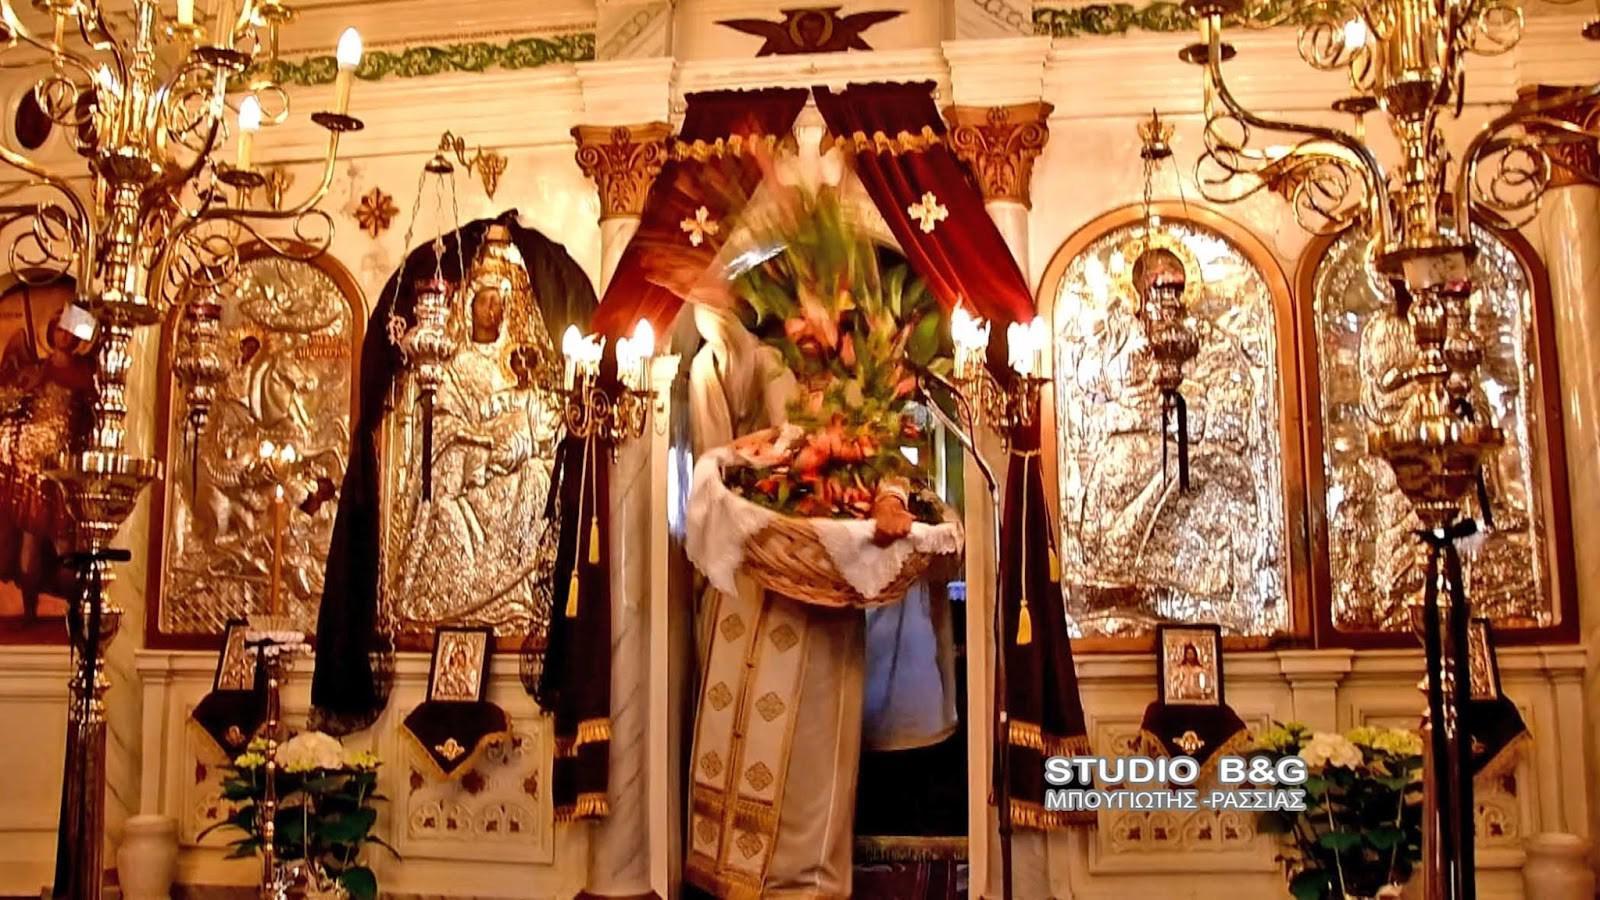 pasxa3 Με σφυριά, κατσαρόλες και κουτάλια η Πρώτη Ανάσταση στο Ναύπλιο [βίντεο]